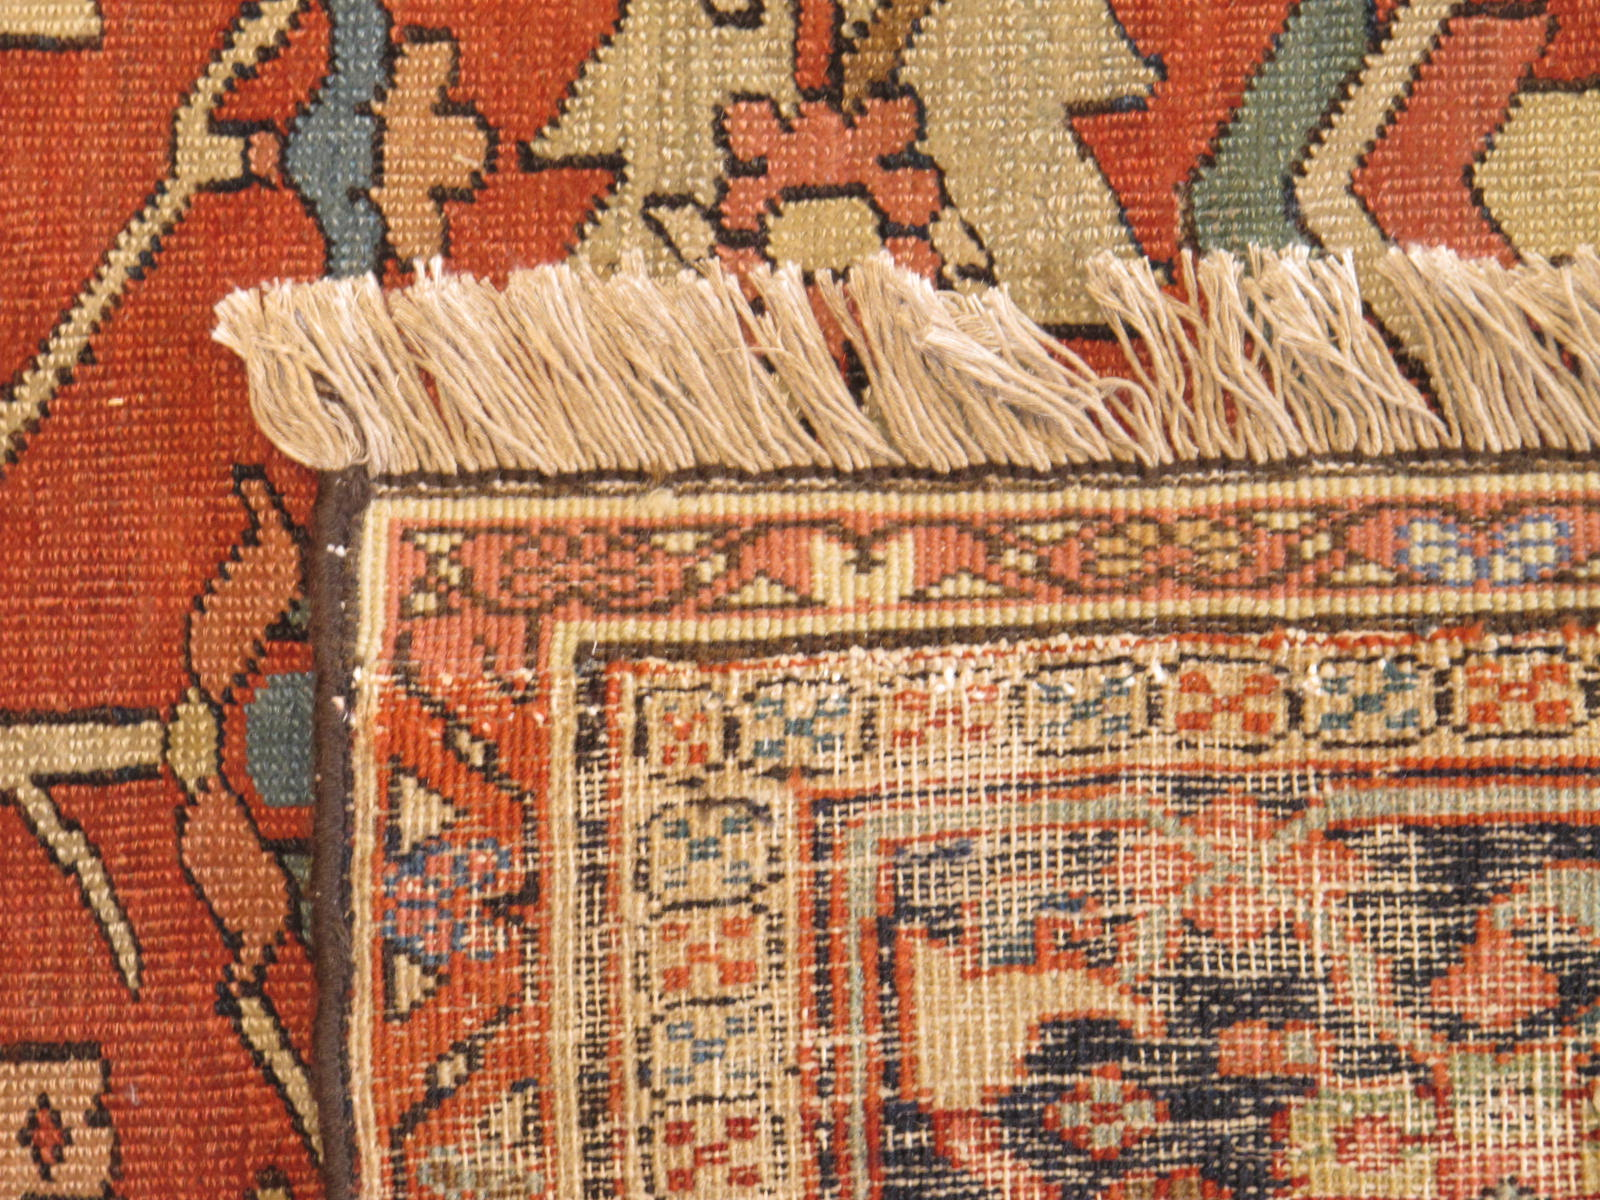 23203 antique persian serapi carpet 9,10 x 14 (5)